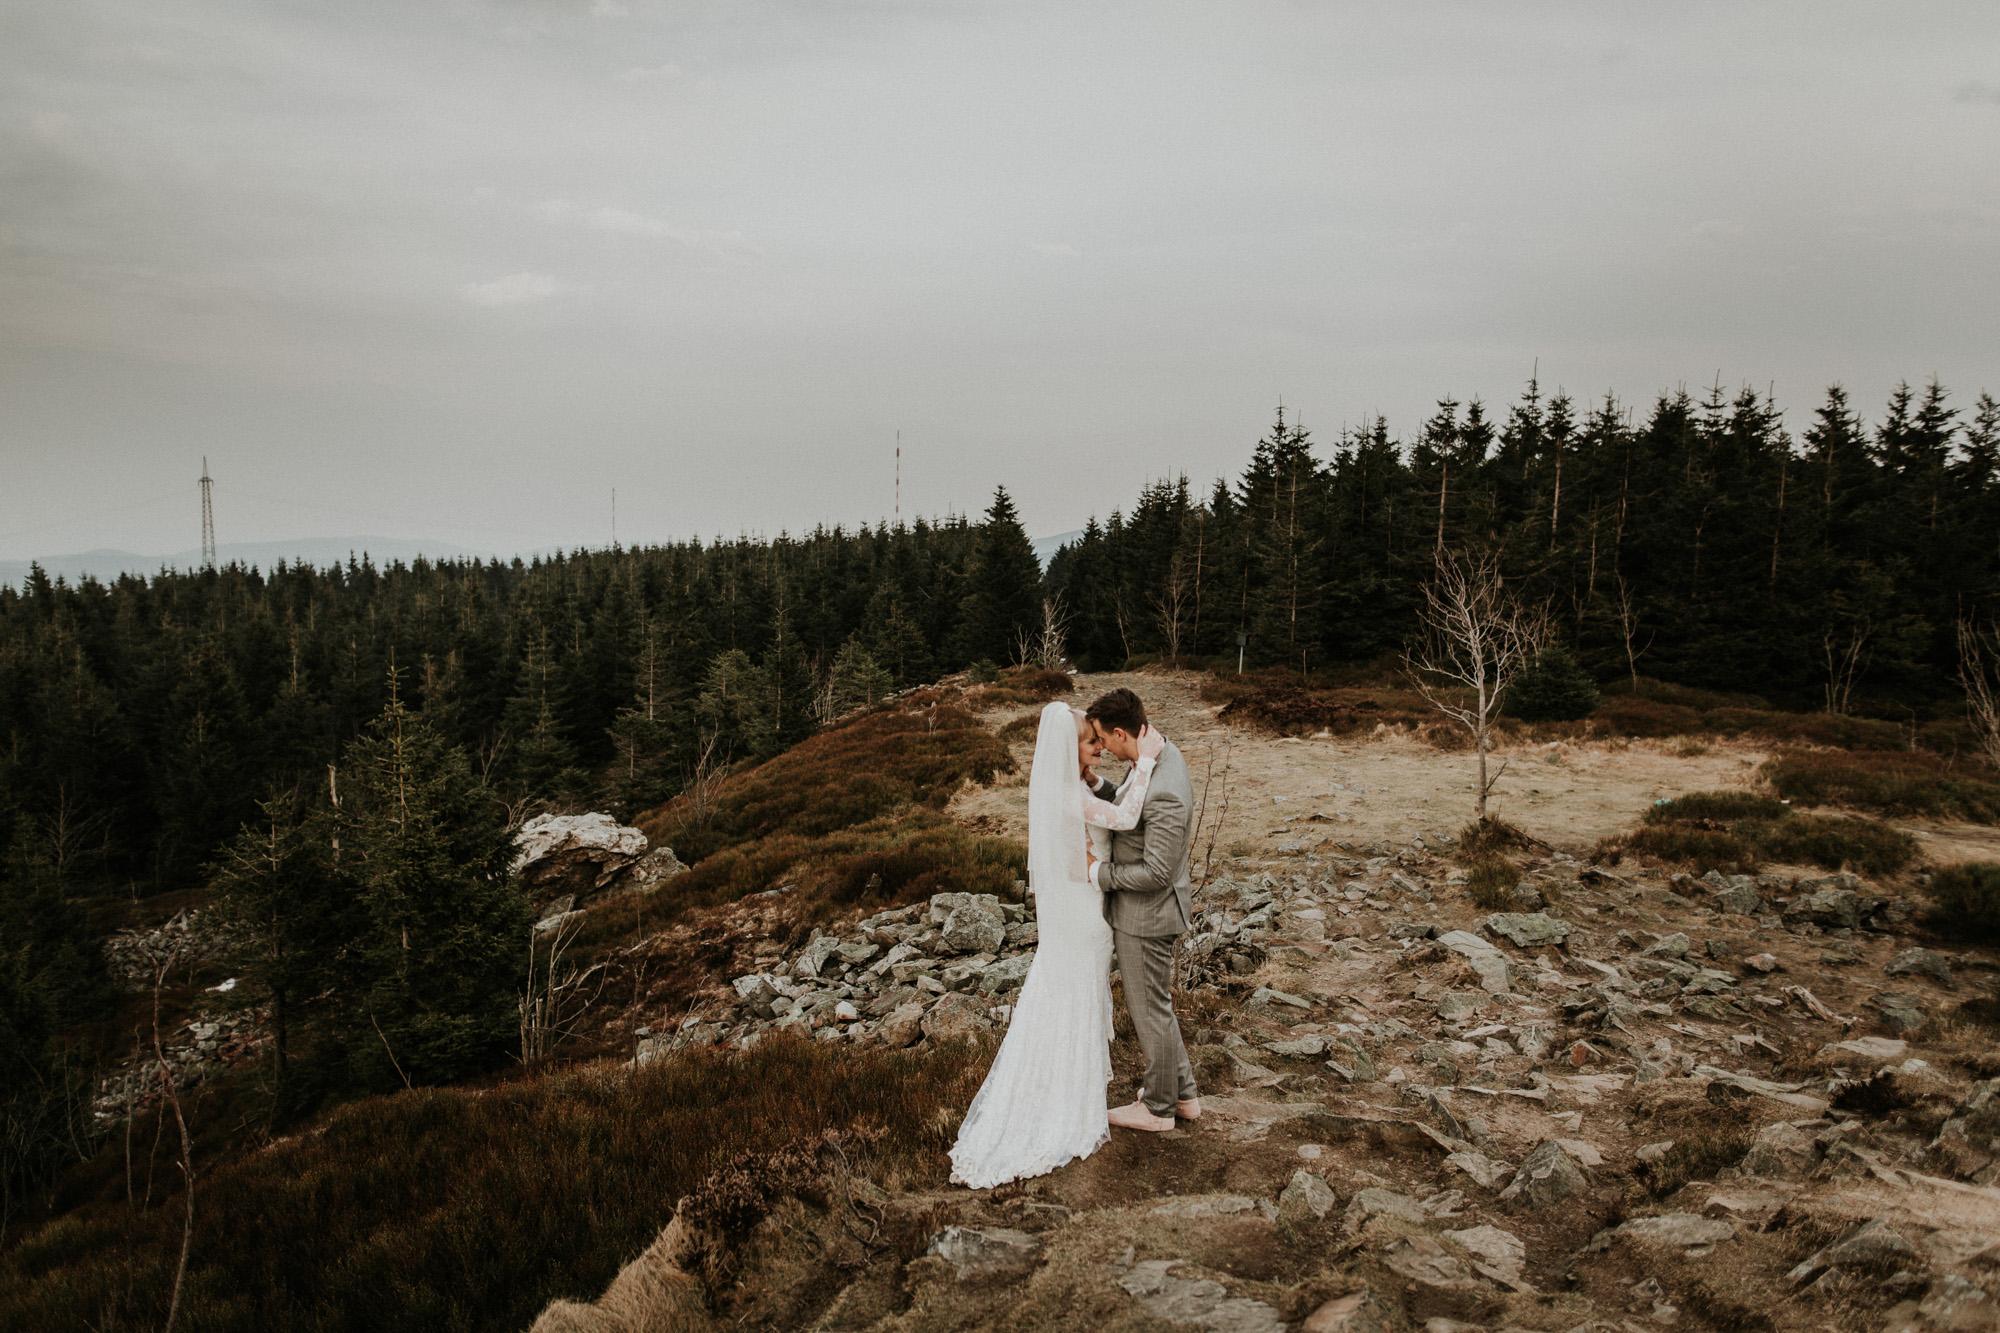 DanielaMarquardtPhotography_Hochzeitsfotograf_Düsseldorf_Köln_Mallorca_Bayern_Austria_Harz_LinaundMaik_Afterwedding-Shooting_Weddingphotographer_Ibiza_Tuskany_Italien_Toskana30